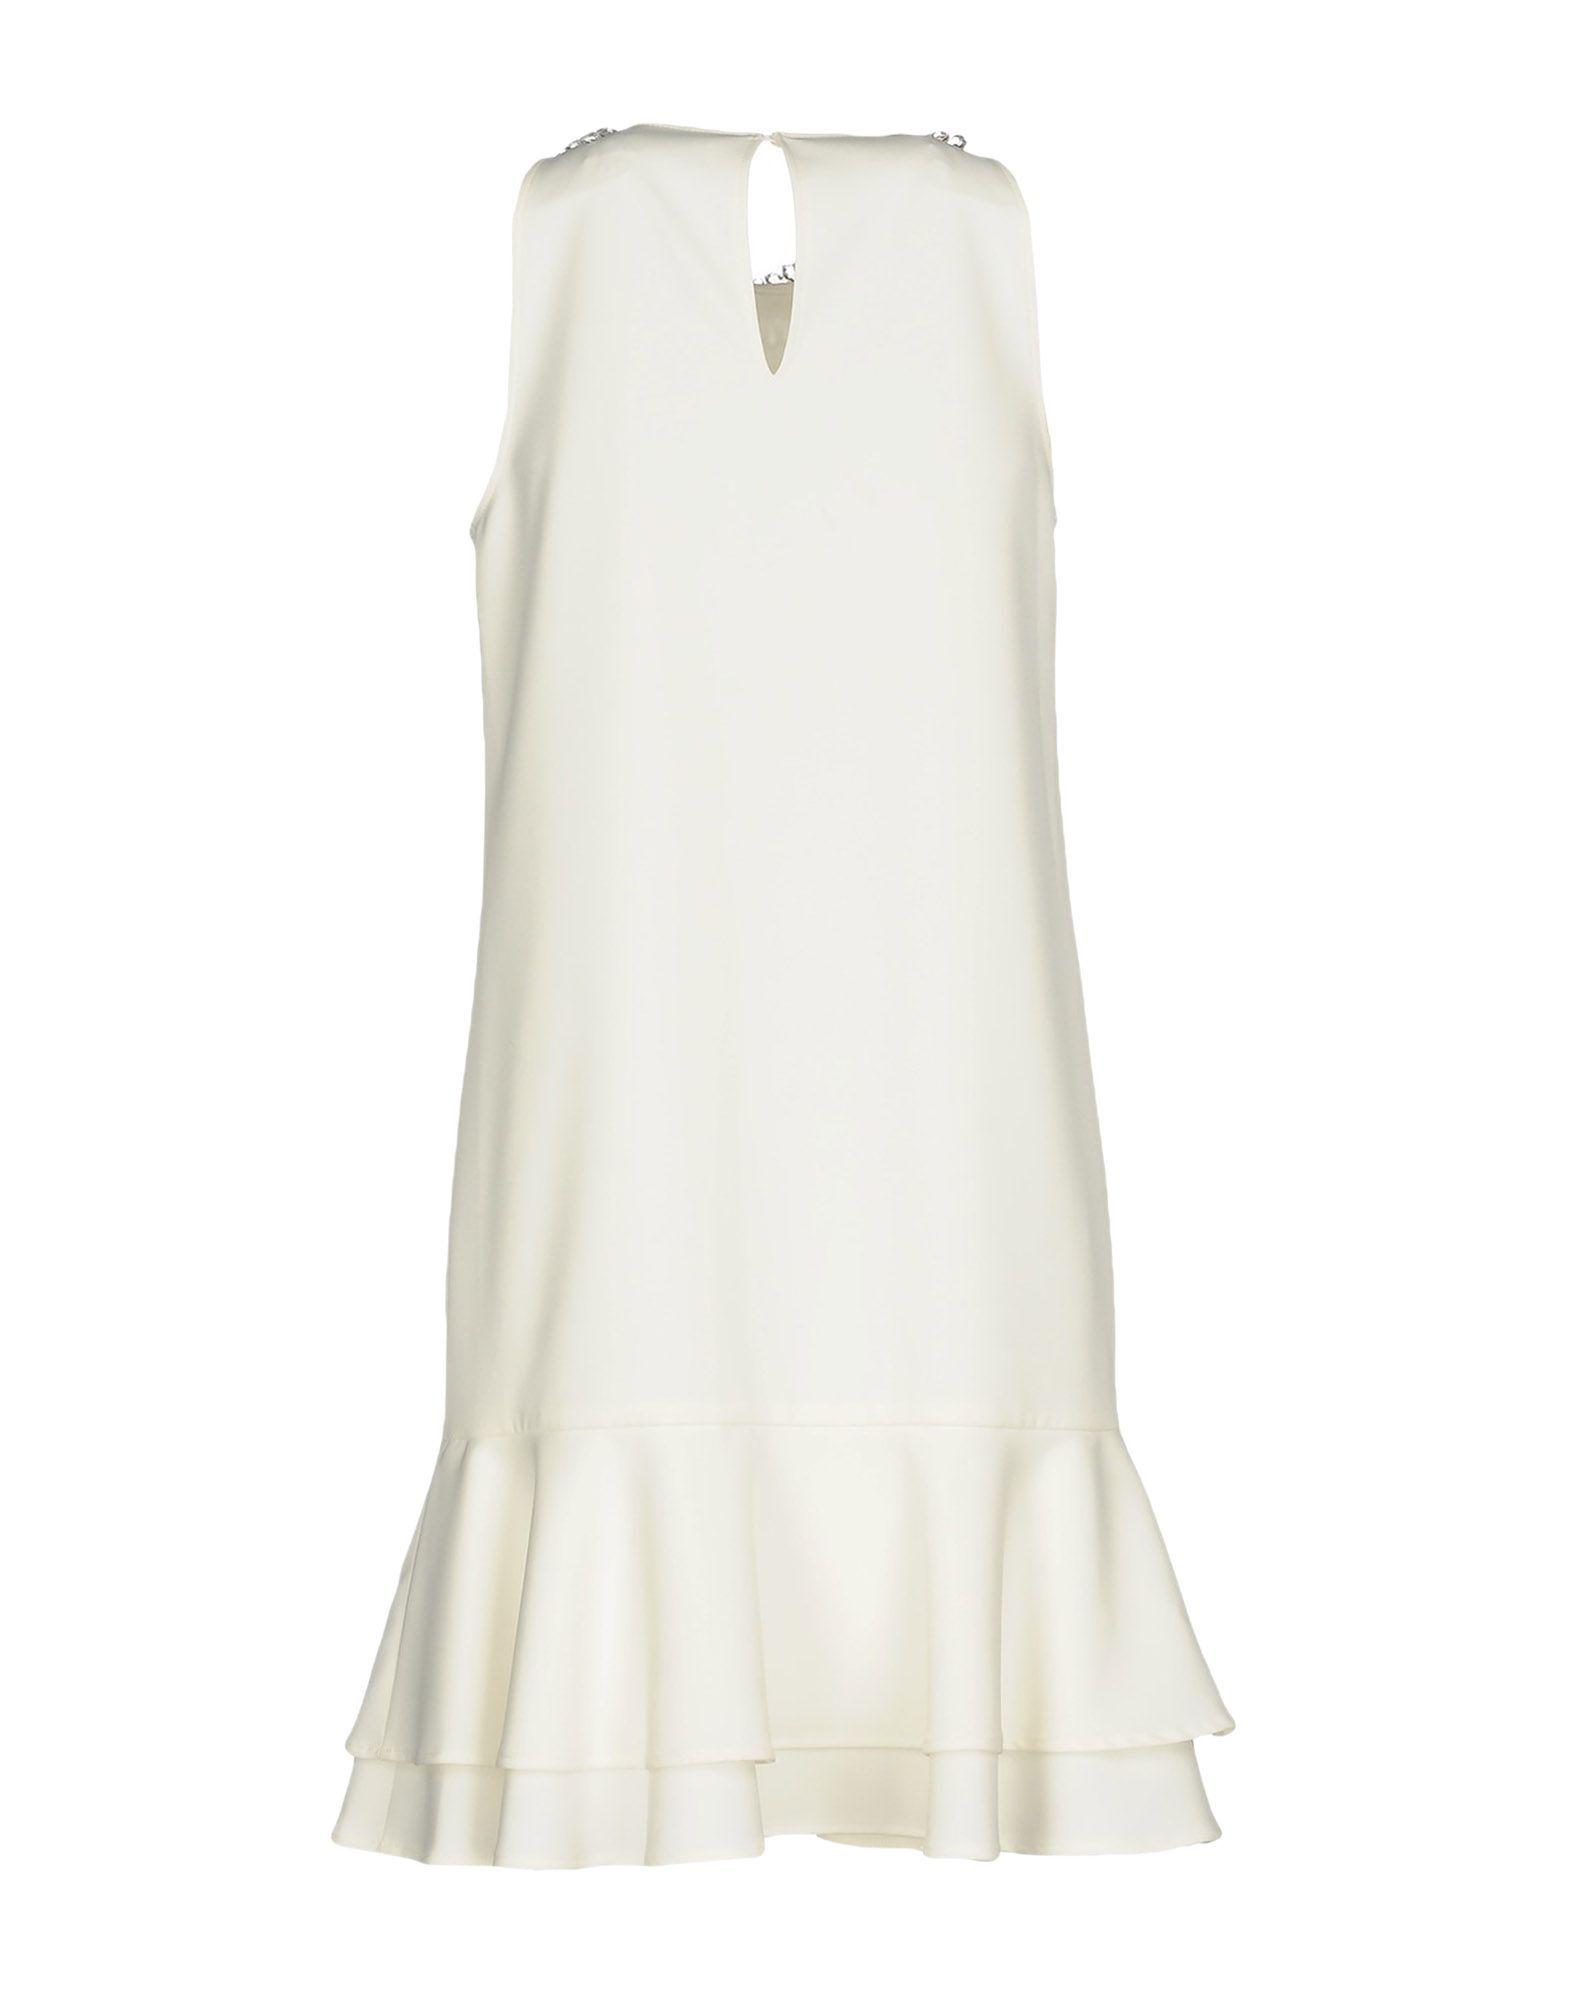 Blugirl Blumarine Ivory Crepe Beaded Dress